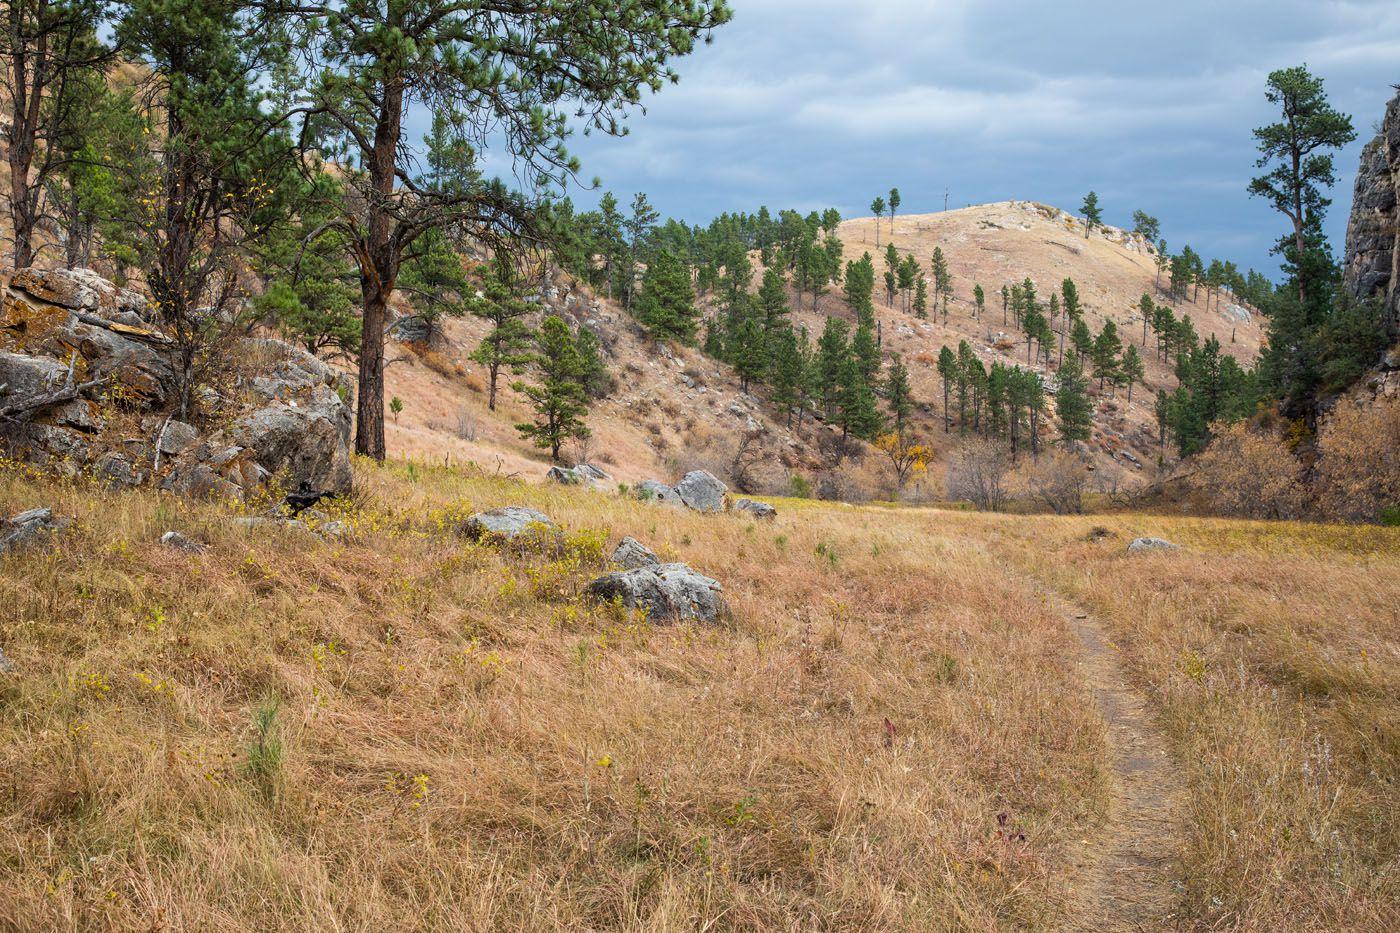 Centennial Trail things to do in South Dakota